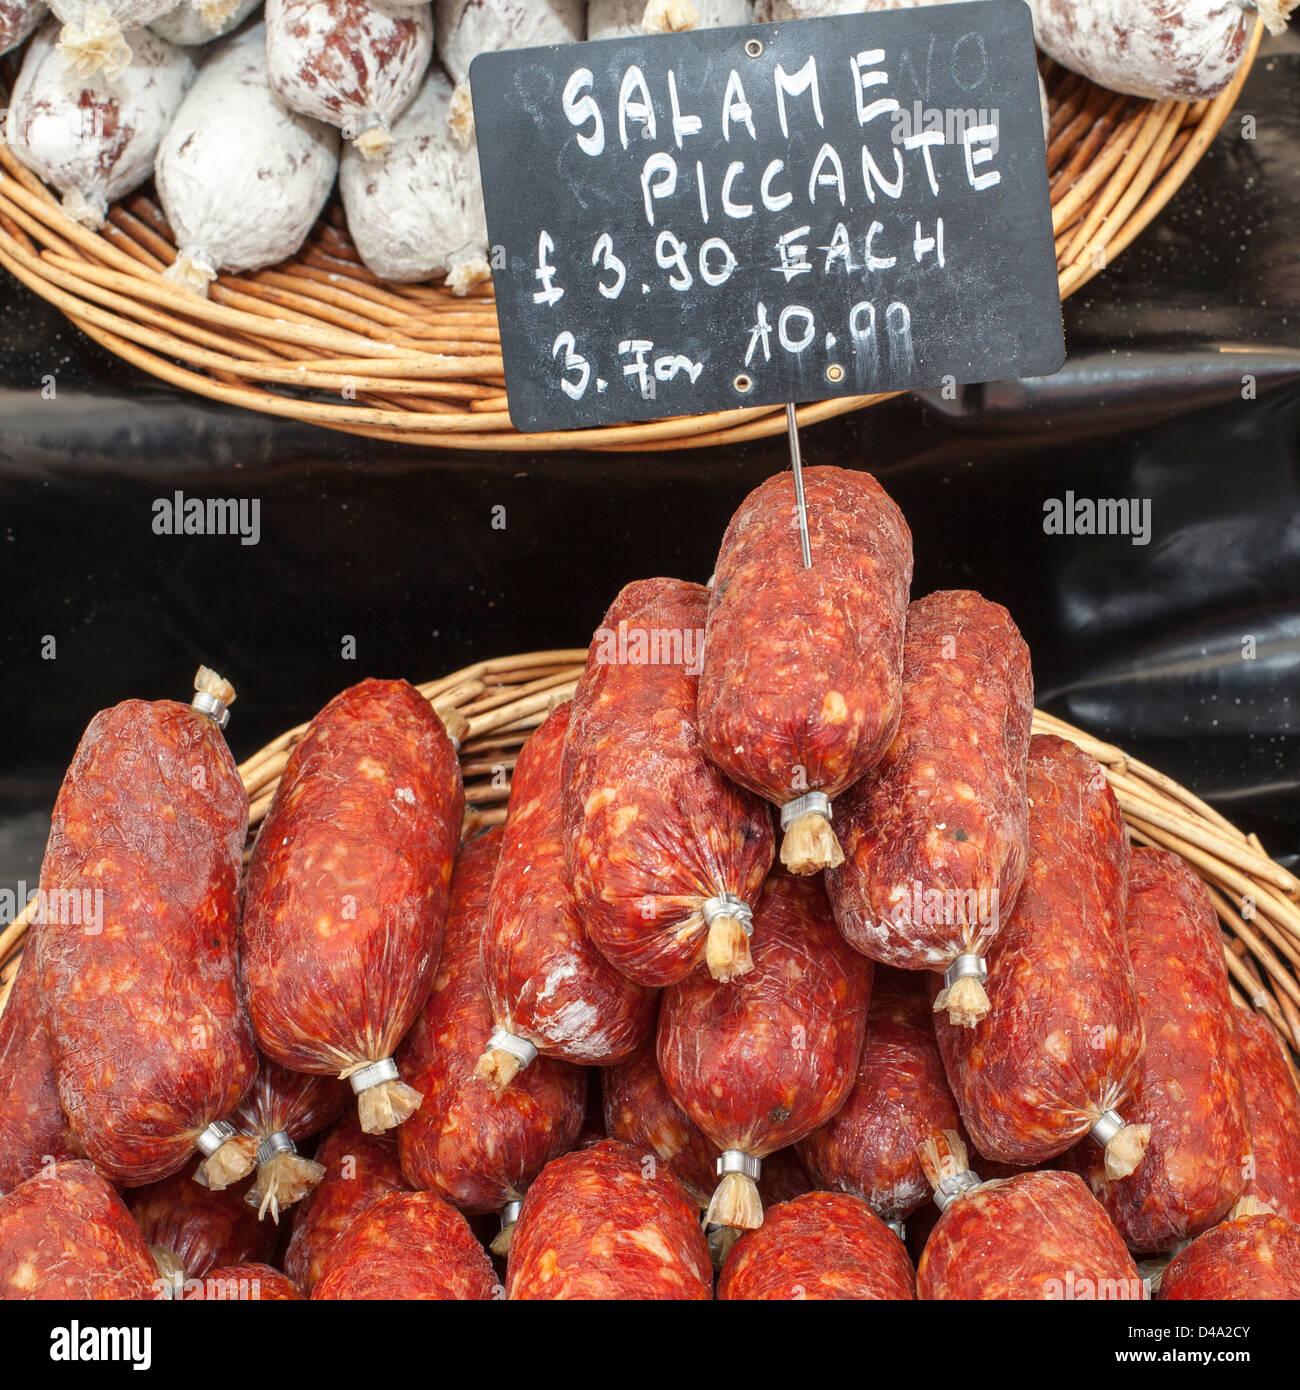 Mobile International Festival Food Prices